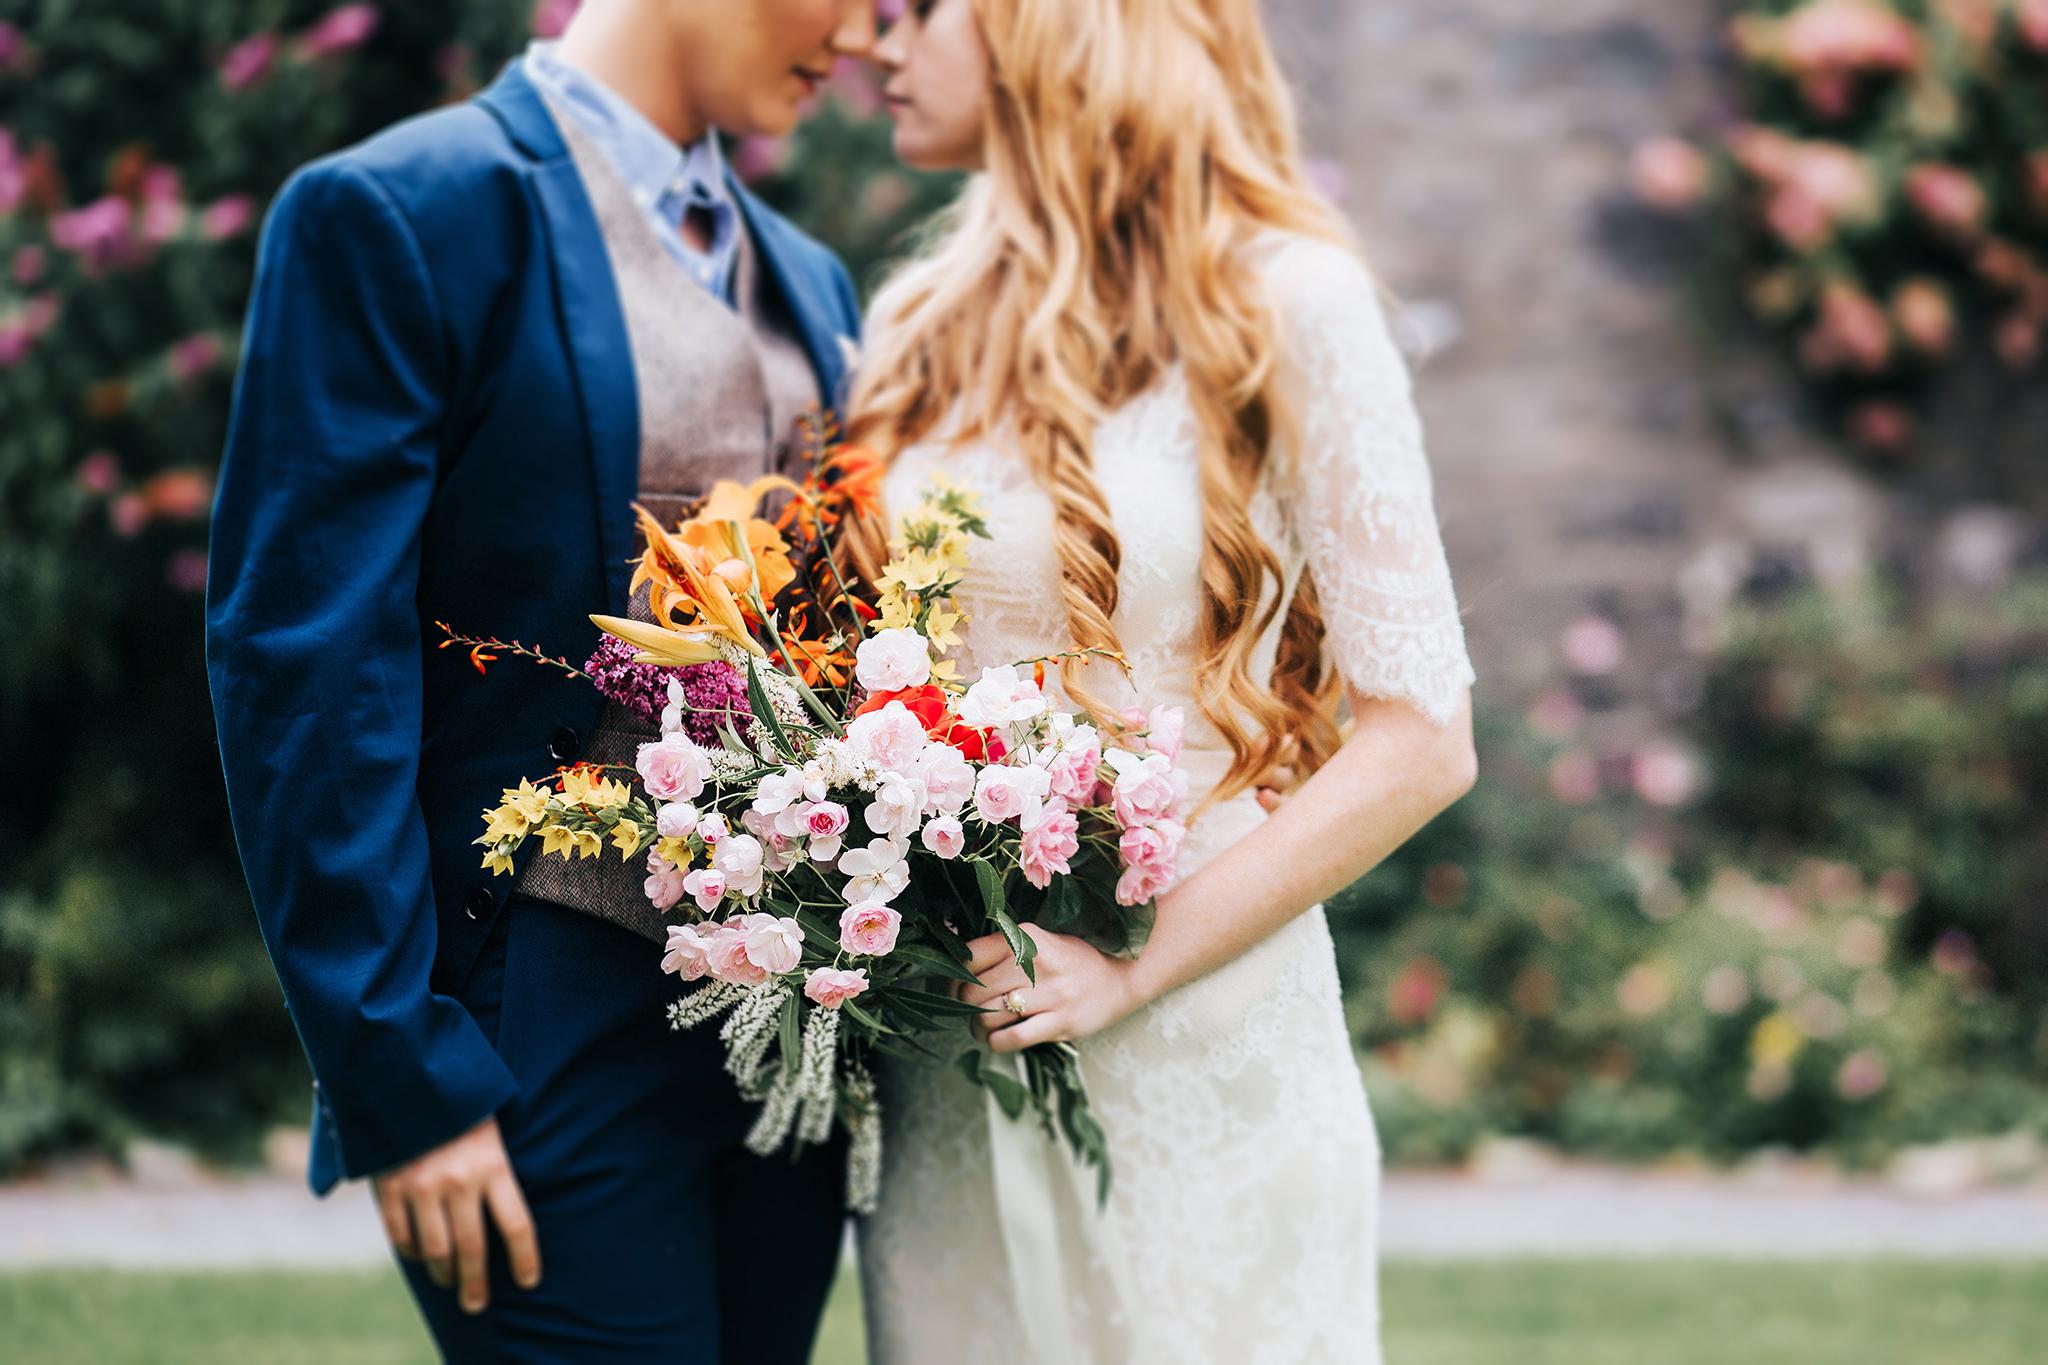 Ireland Elopement wedding photographer